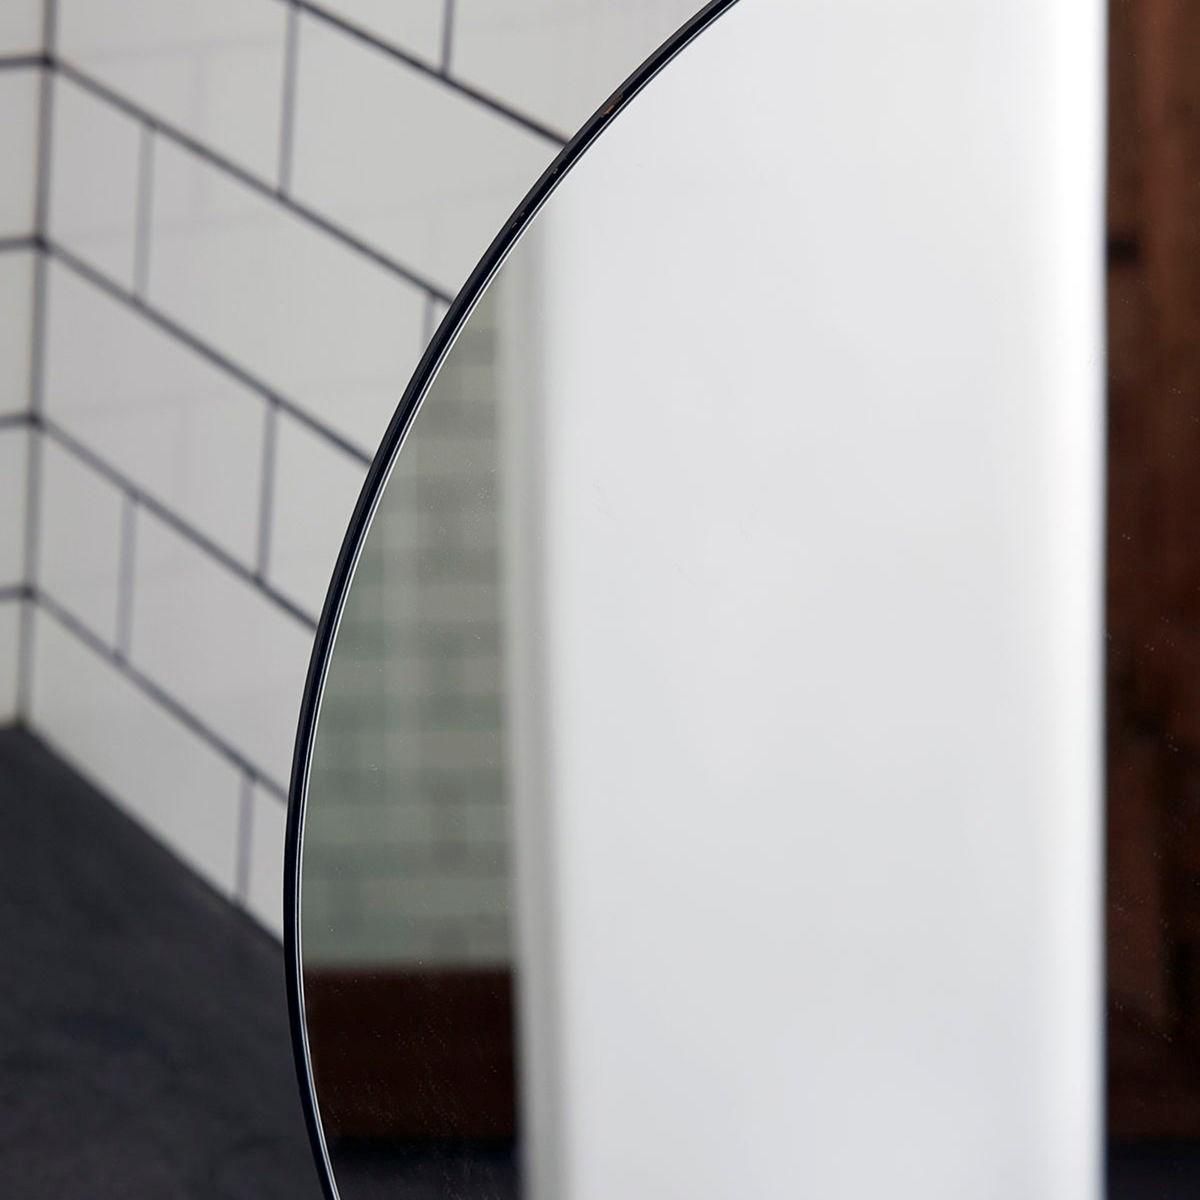 Zrcadlo WALL 80 cm kulaté_1